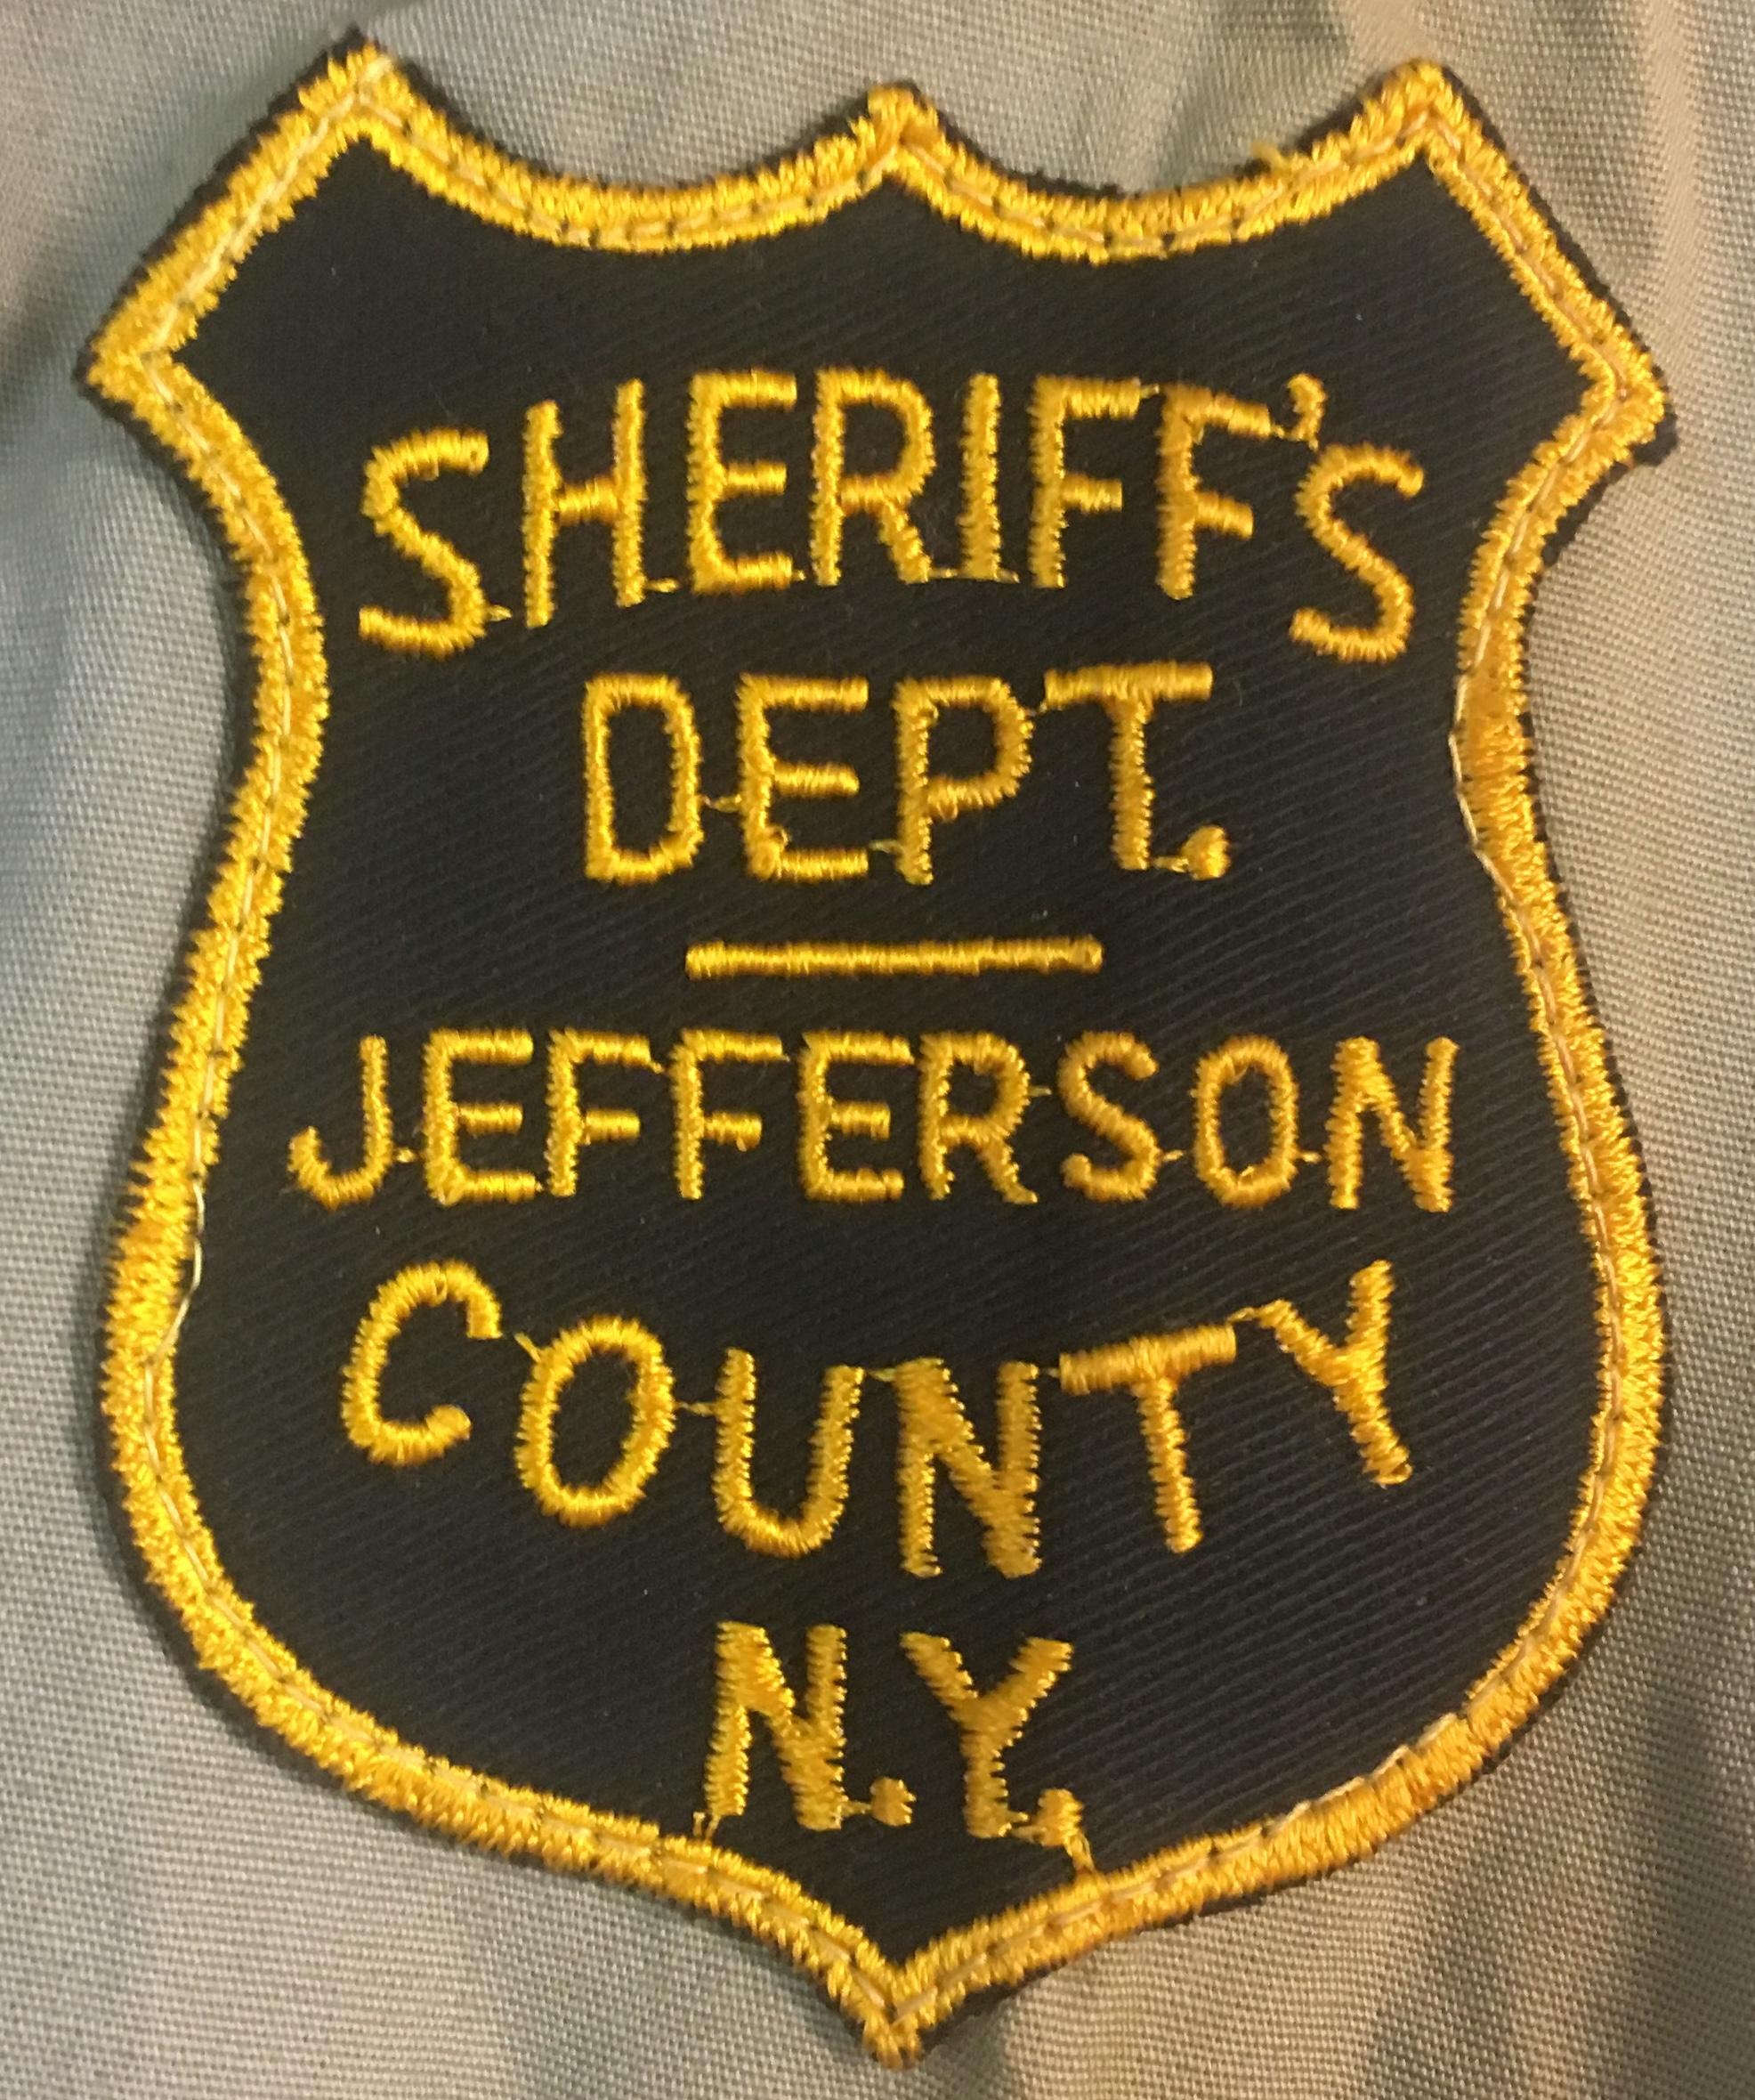 Deputy Sheriff Larry E. Dano | Jefferson County Sheriff's Office, New York